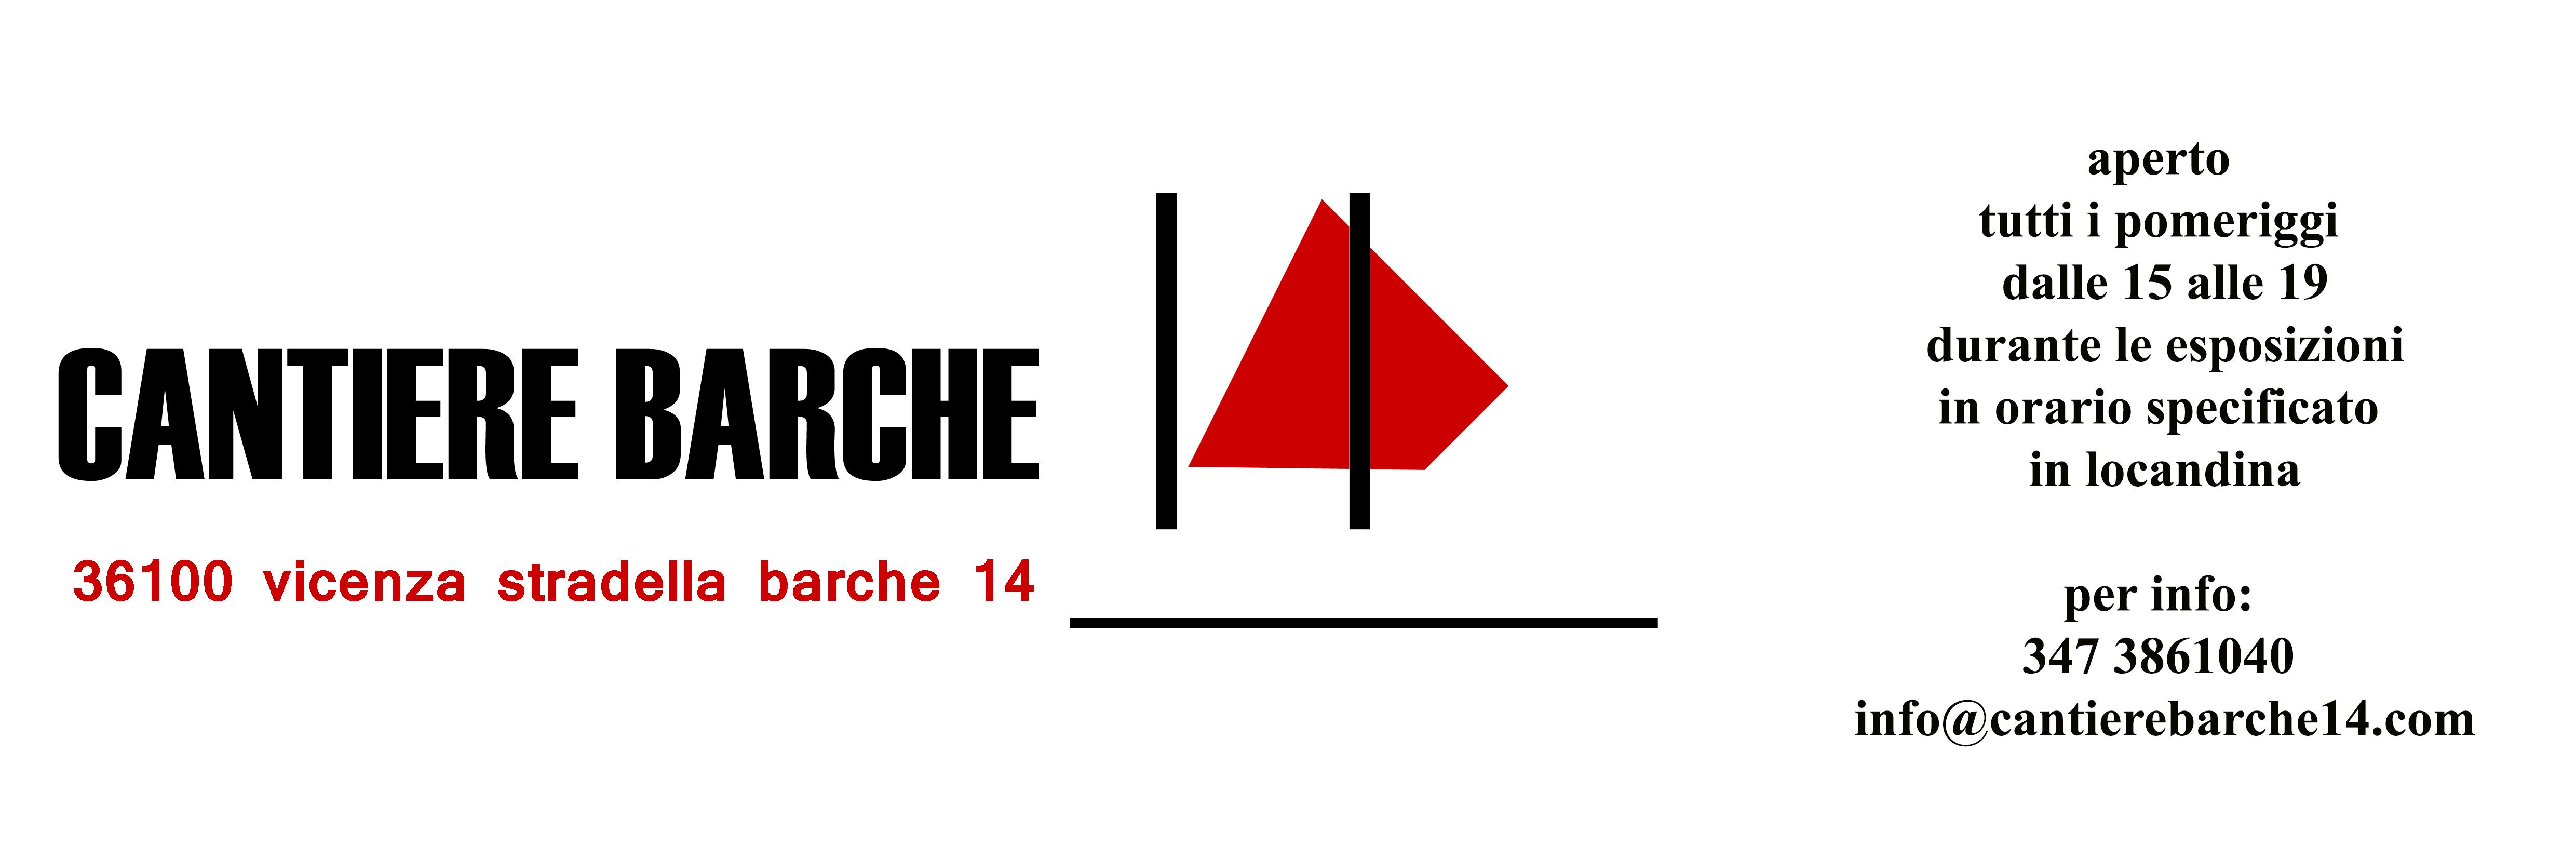 CANTIERE BARCHE 14